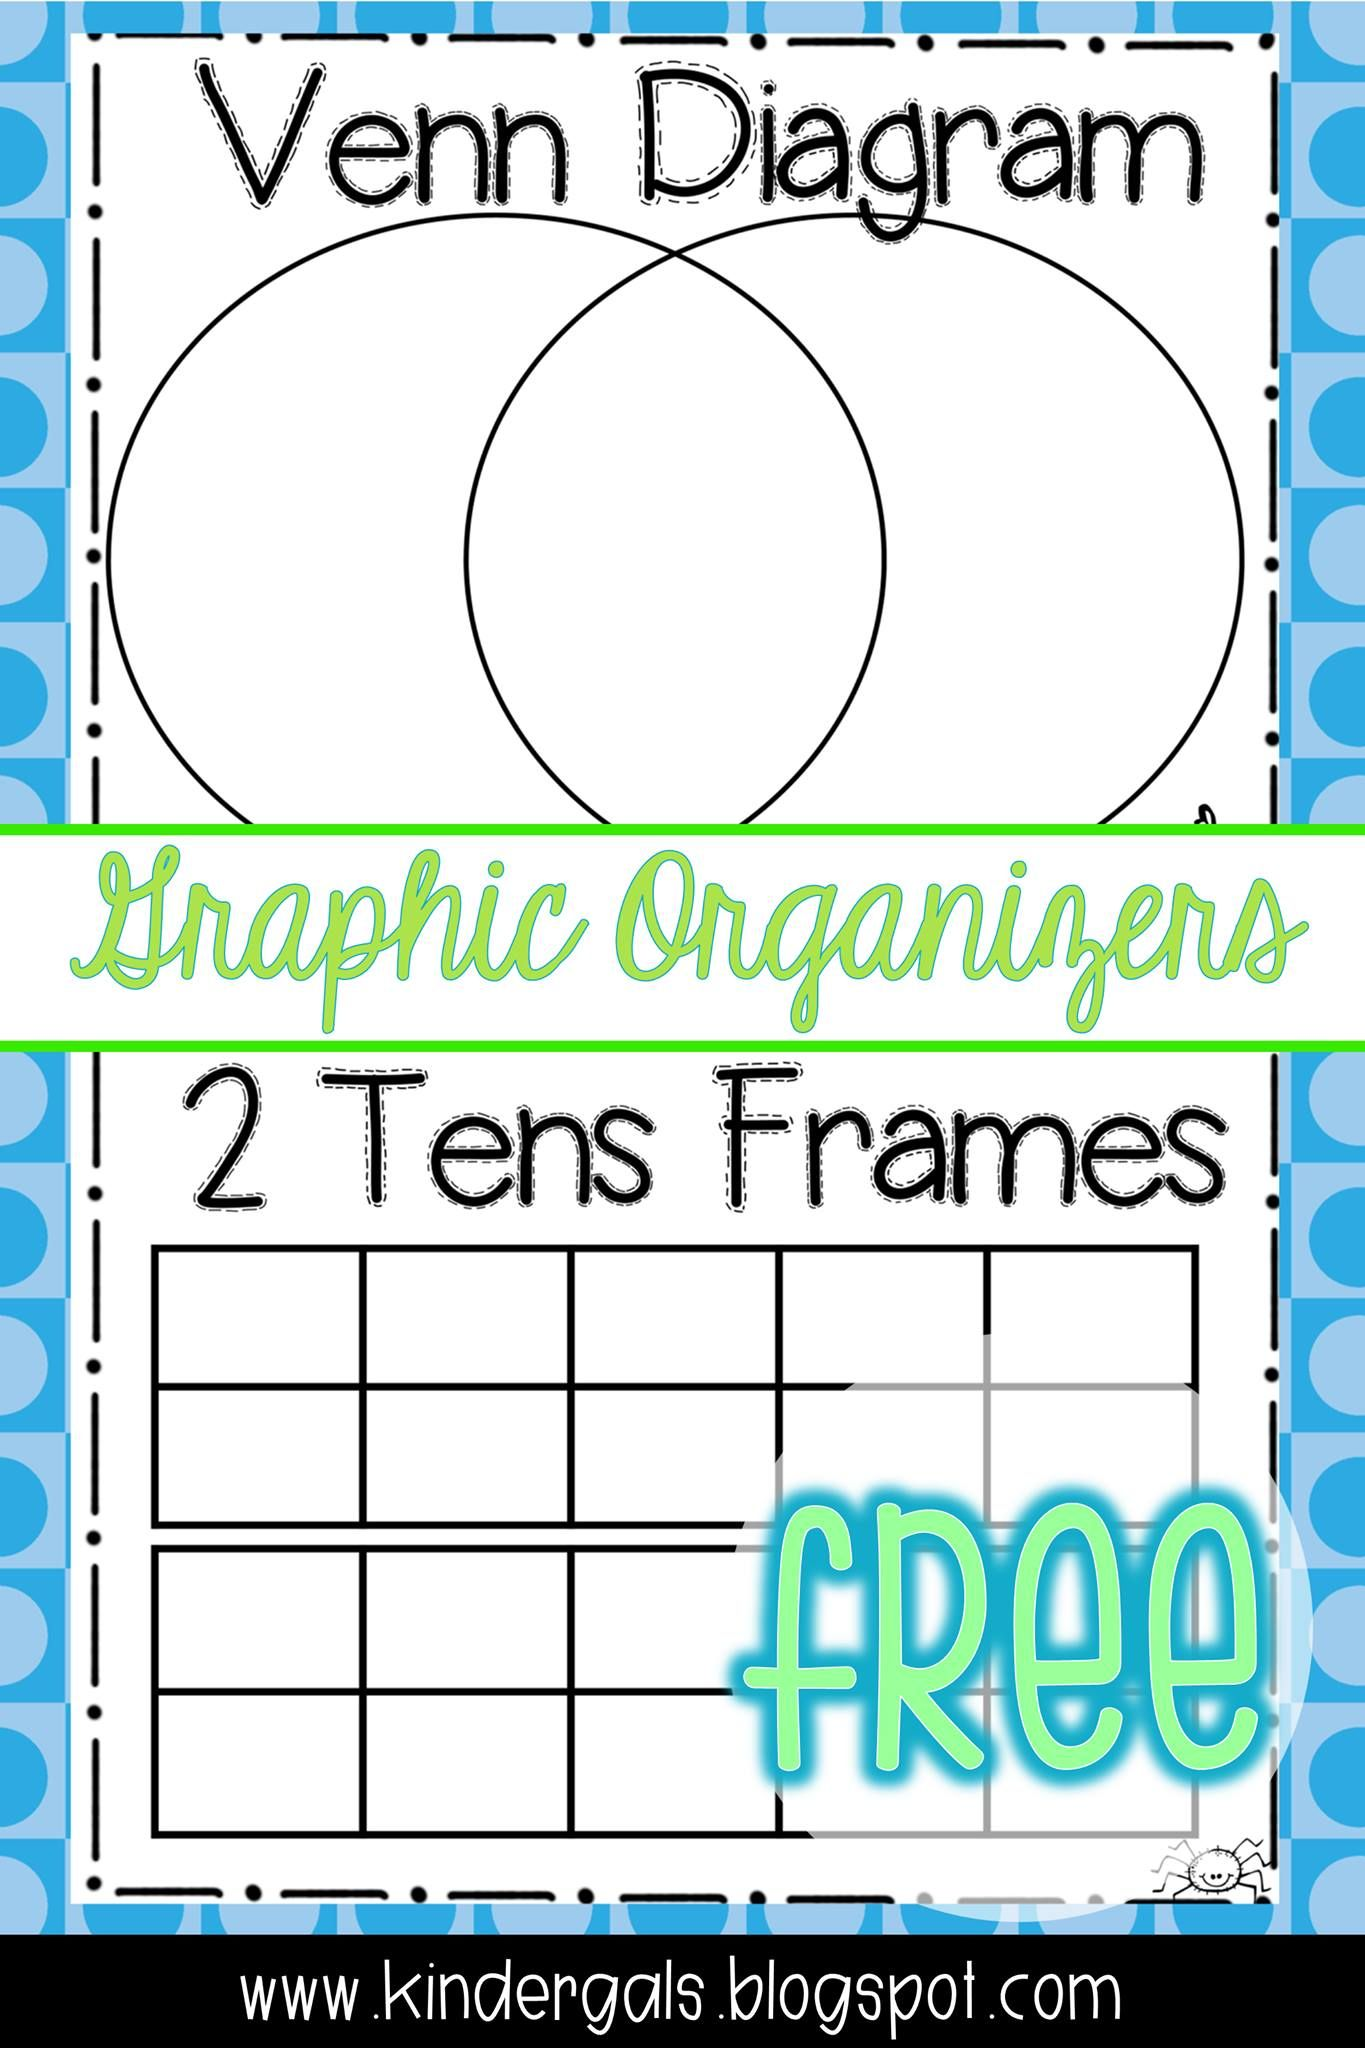 small resolution of venn diagram and 2 tens frames free downloads for kindergarten teachers